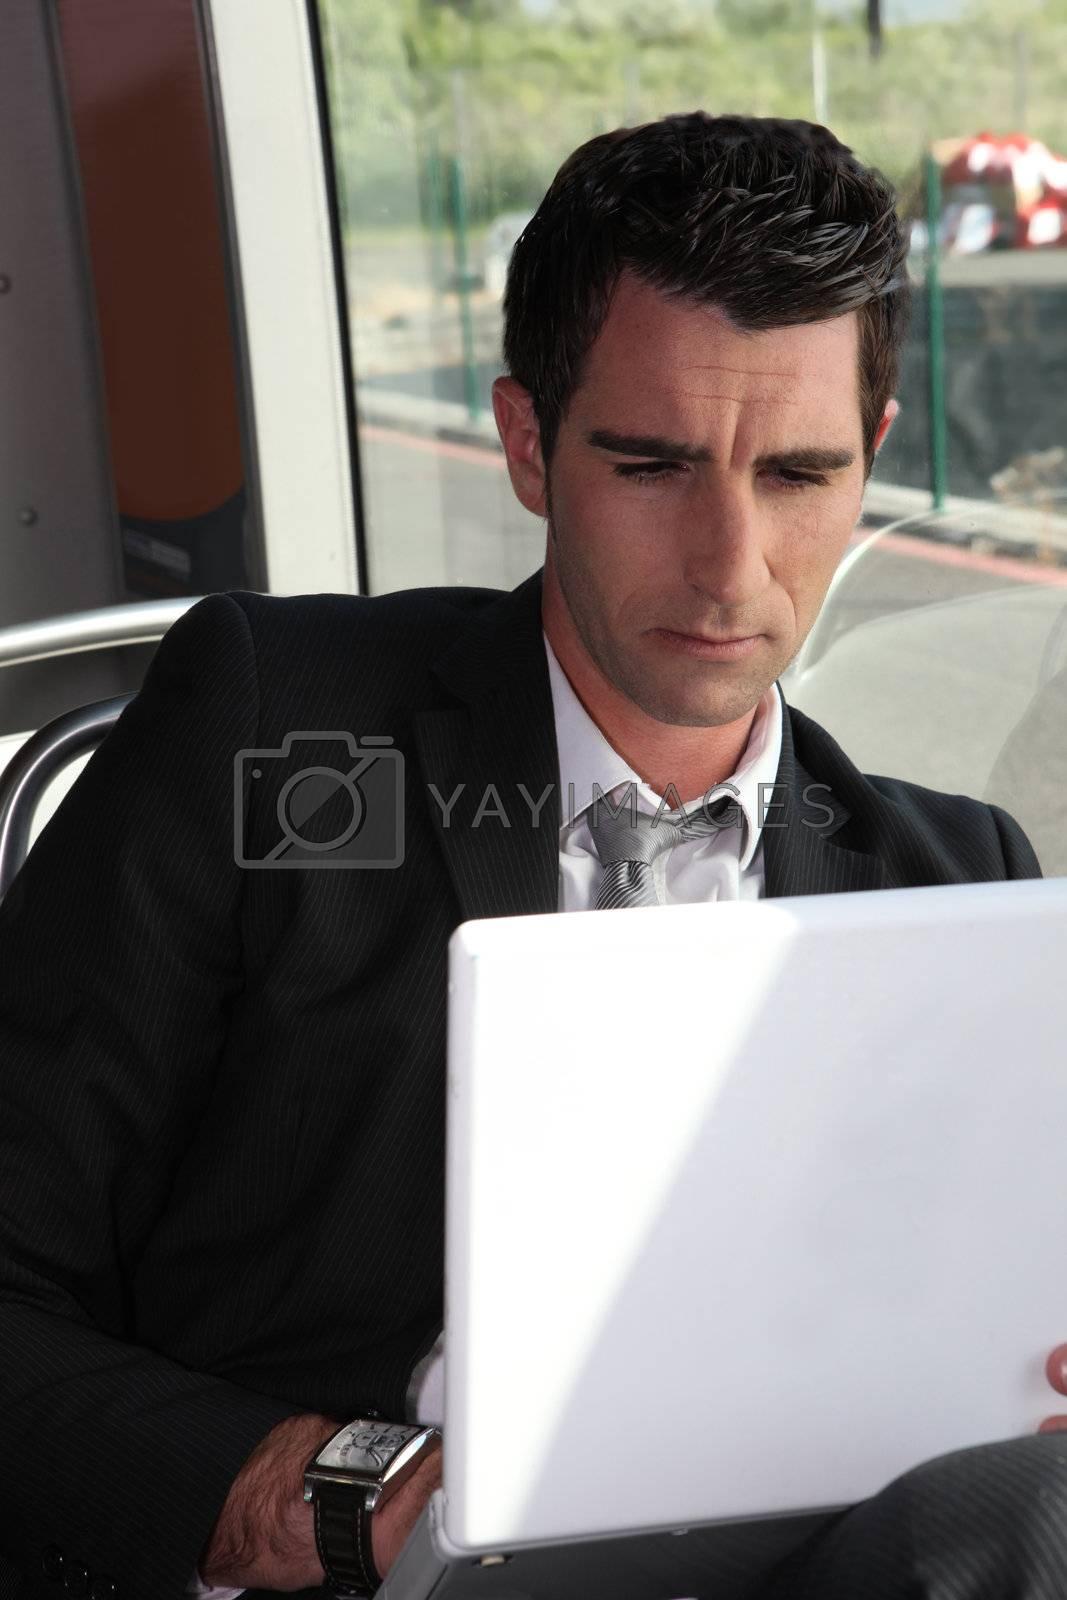 portrait of a man in public transportation by phovoir